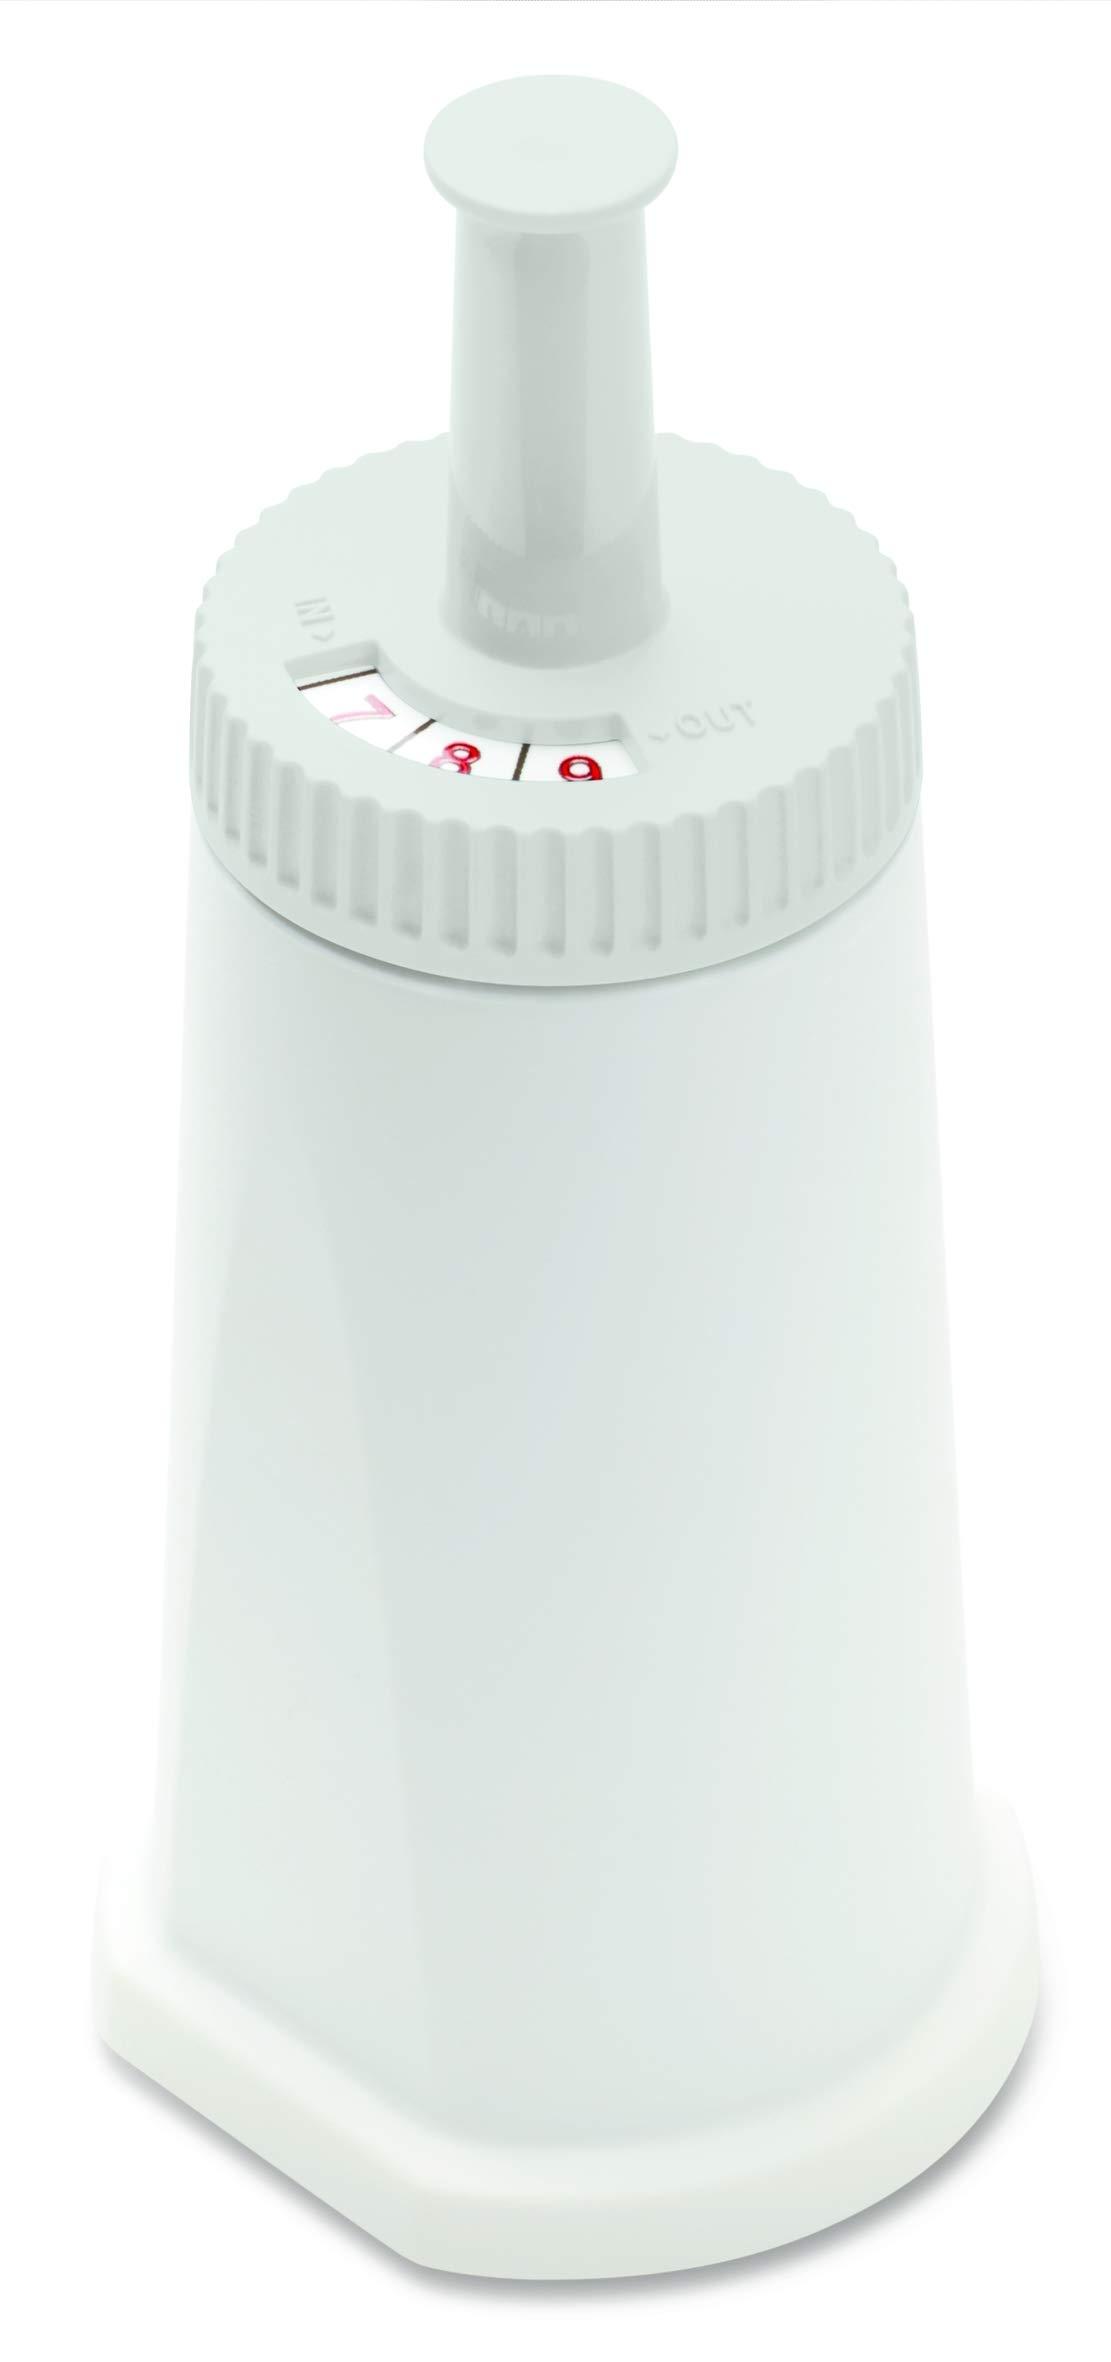 Sage Appliances SES008WHT0NEU1 BES008 ClaroSwiss Water Filter, Plastic, White